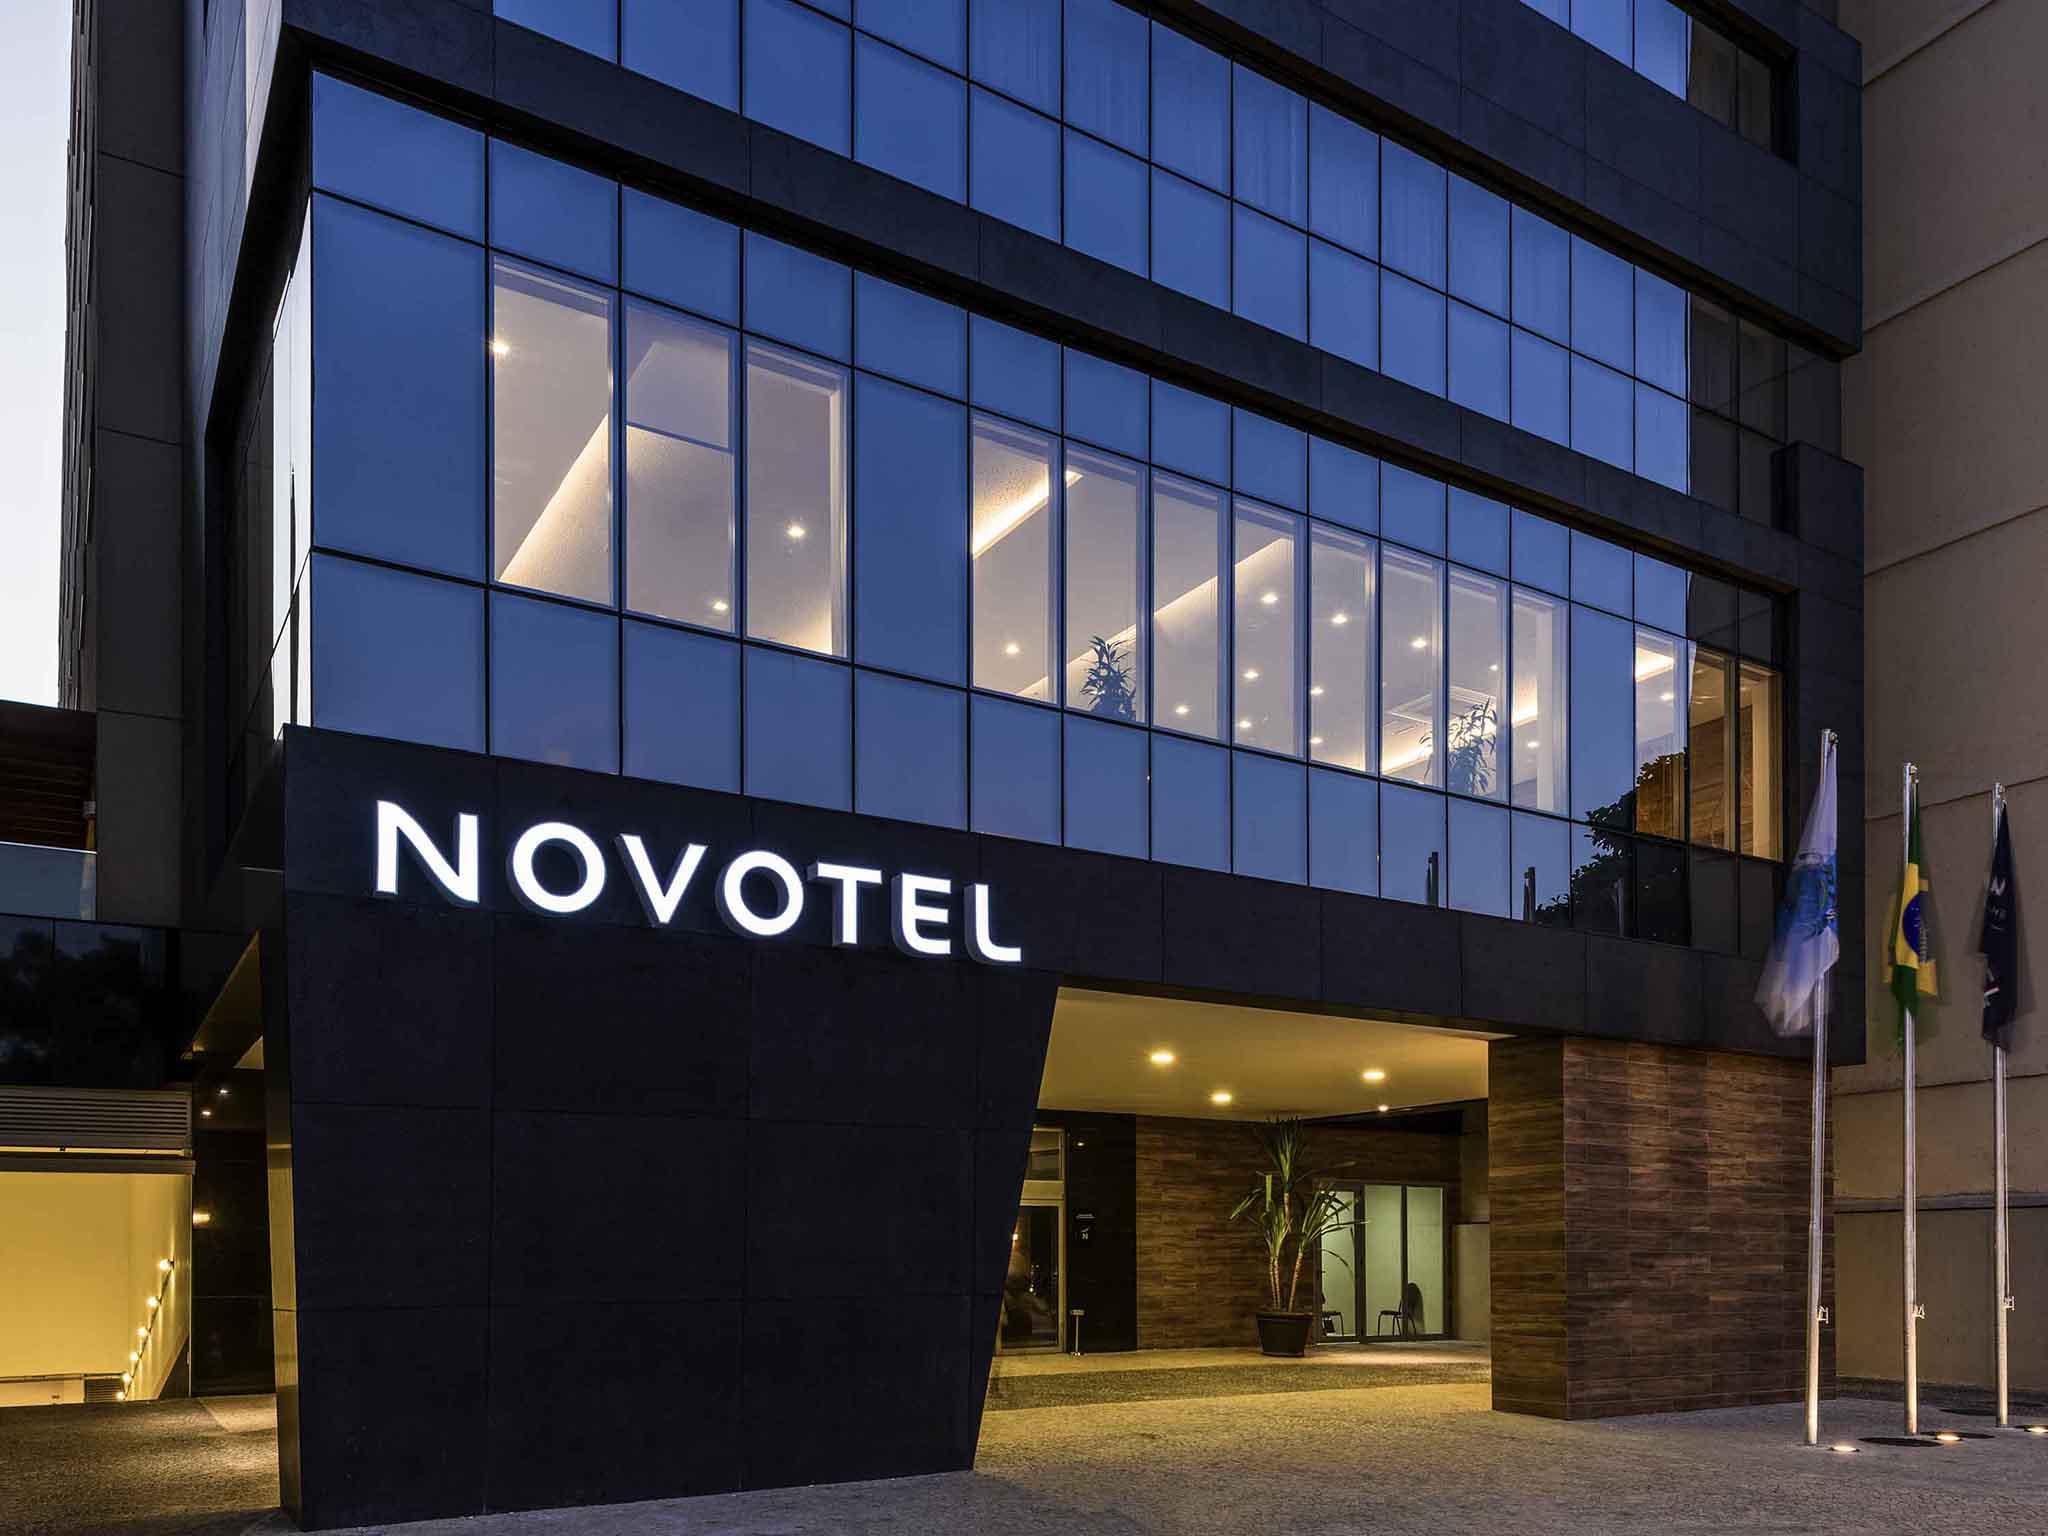 Hotell – Novotel RJ Praia de Botafogo